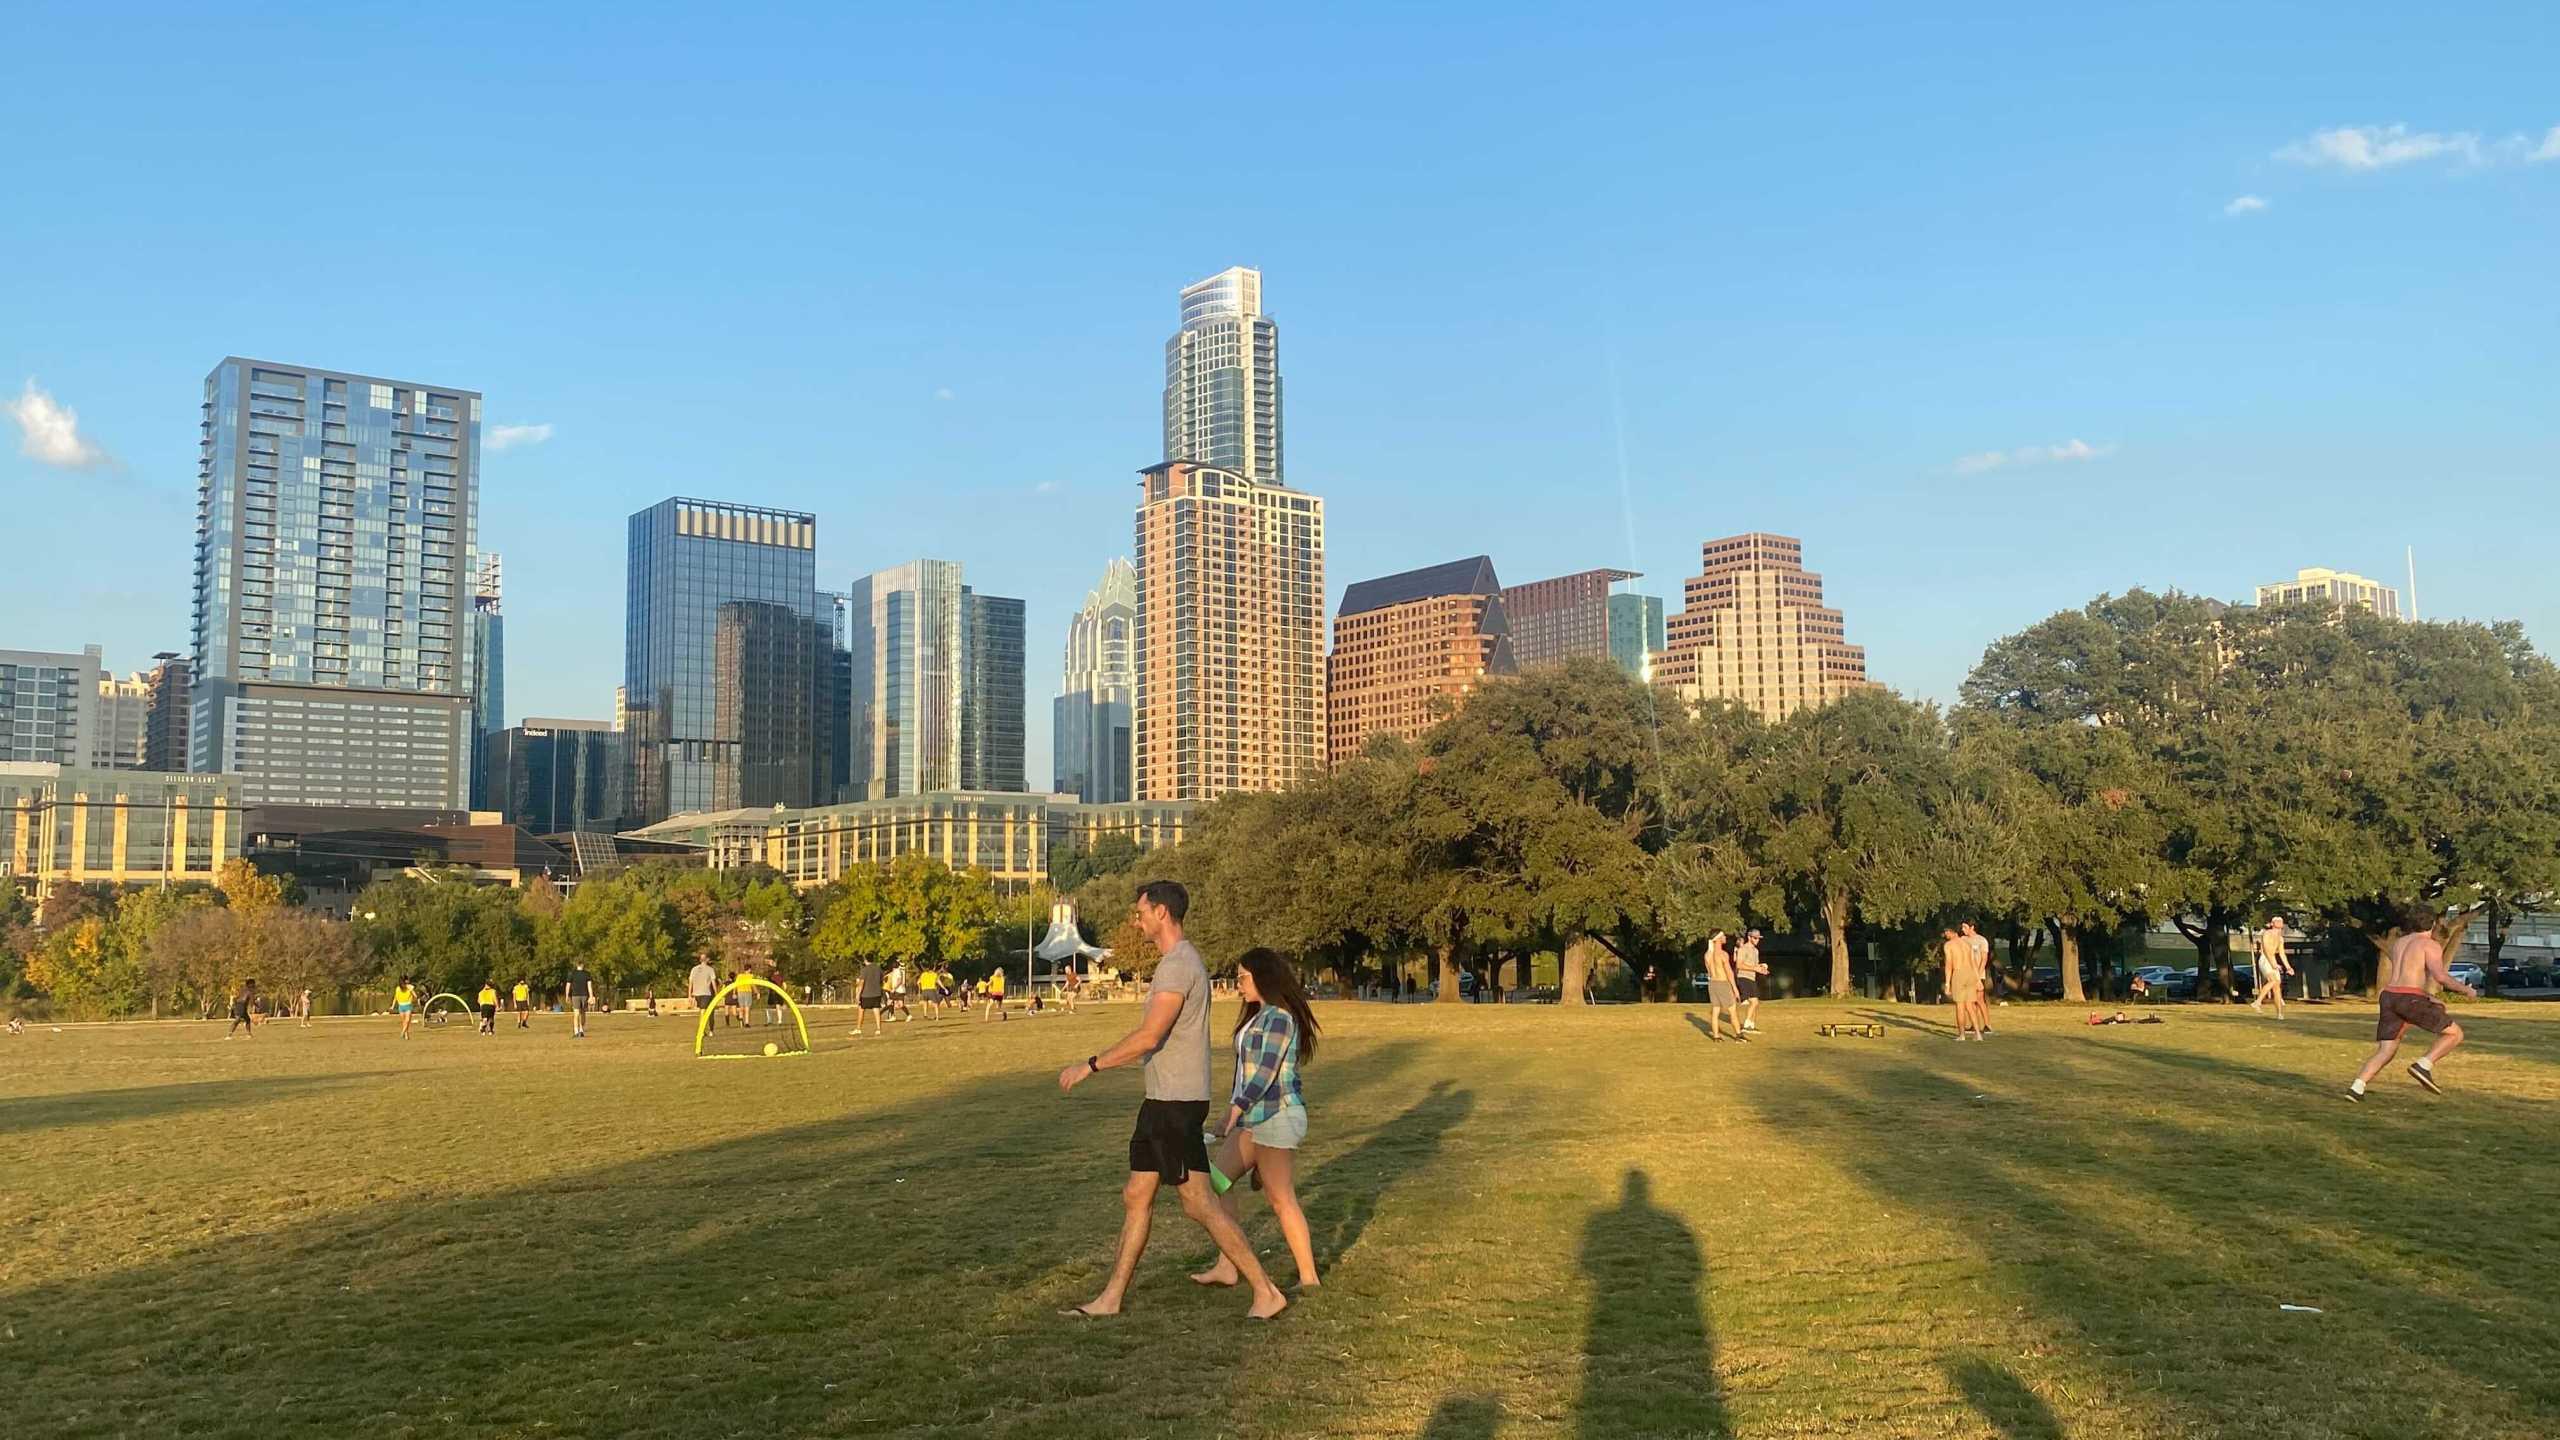 Downtown Austin (KXAN/Todd Bynum)